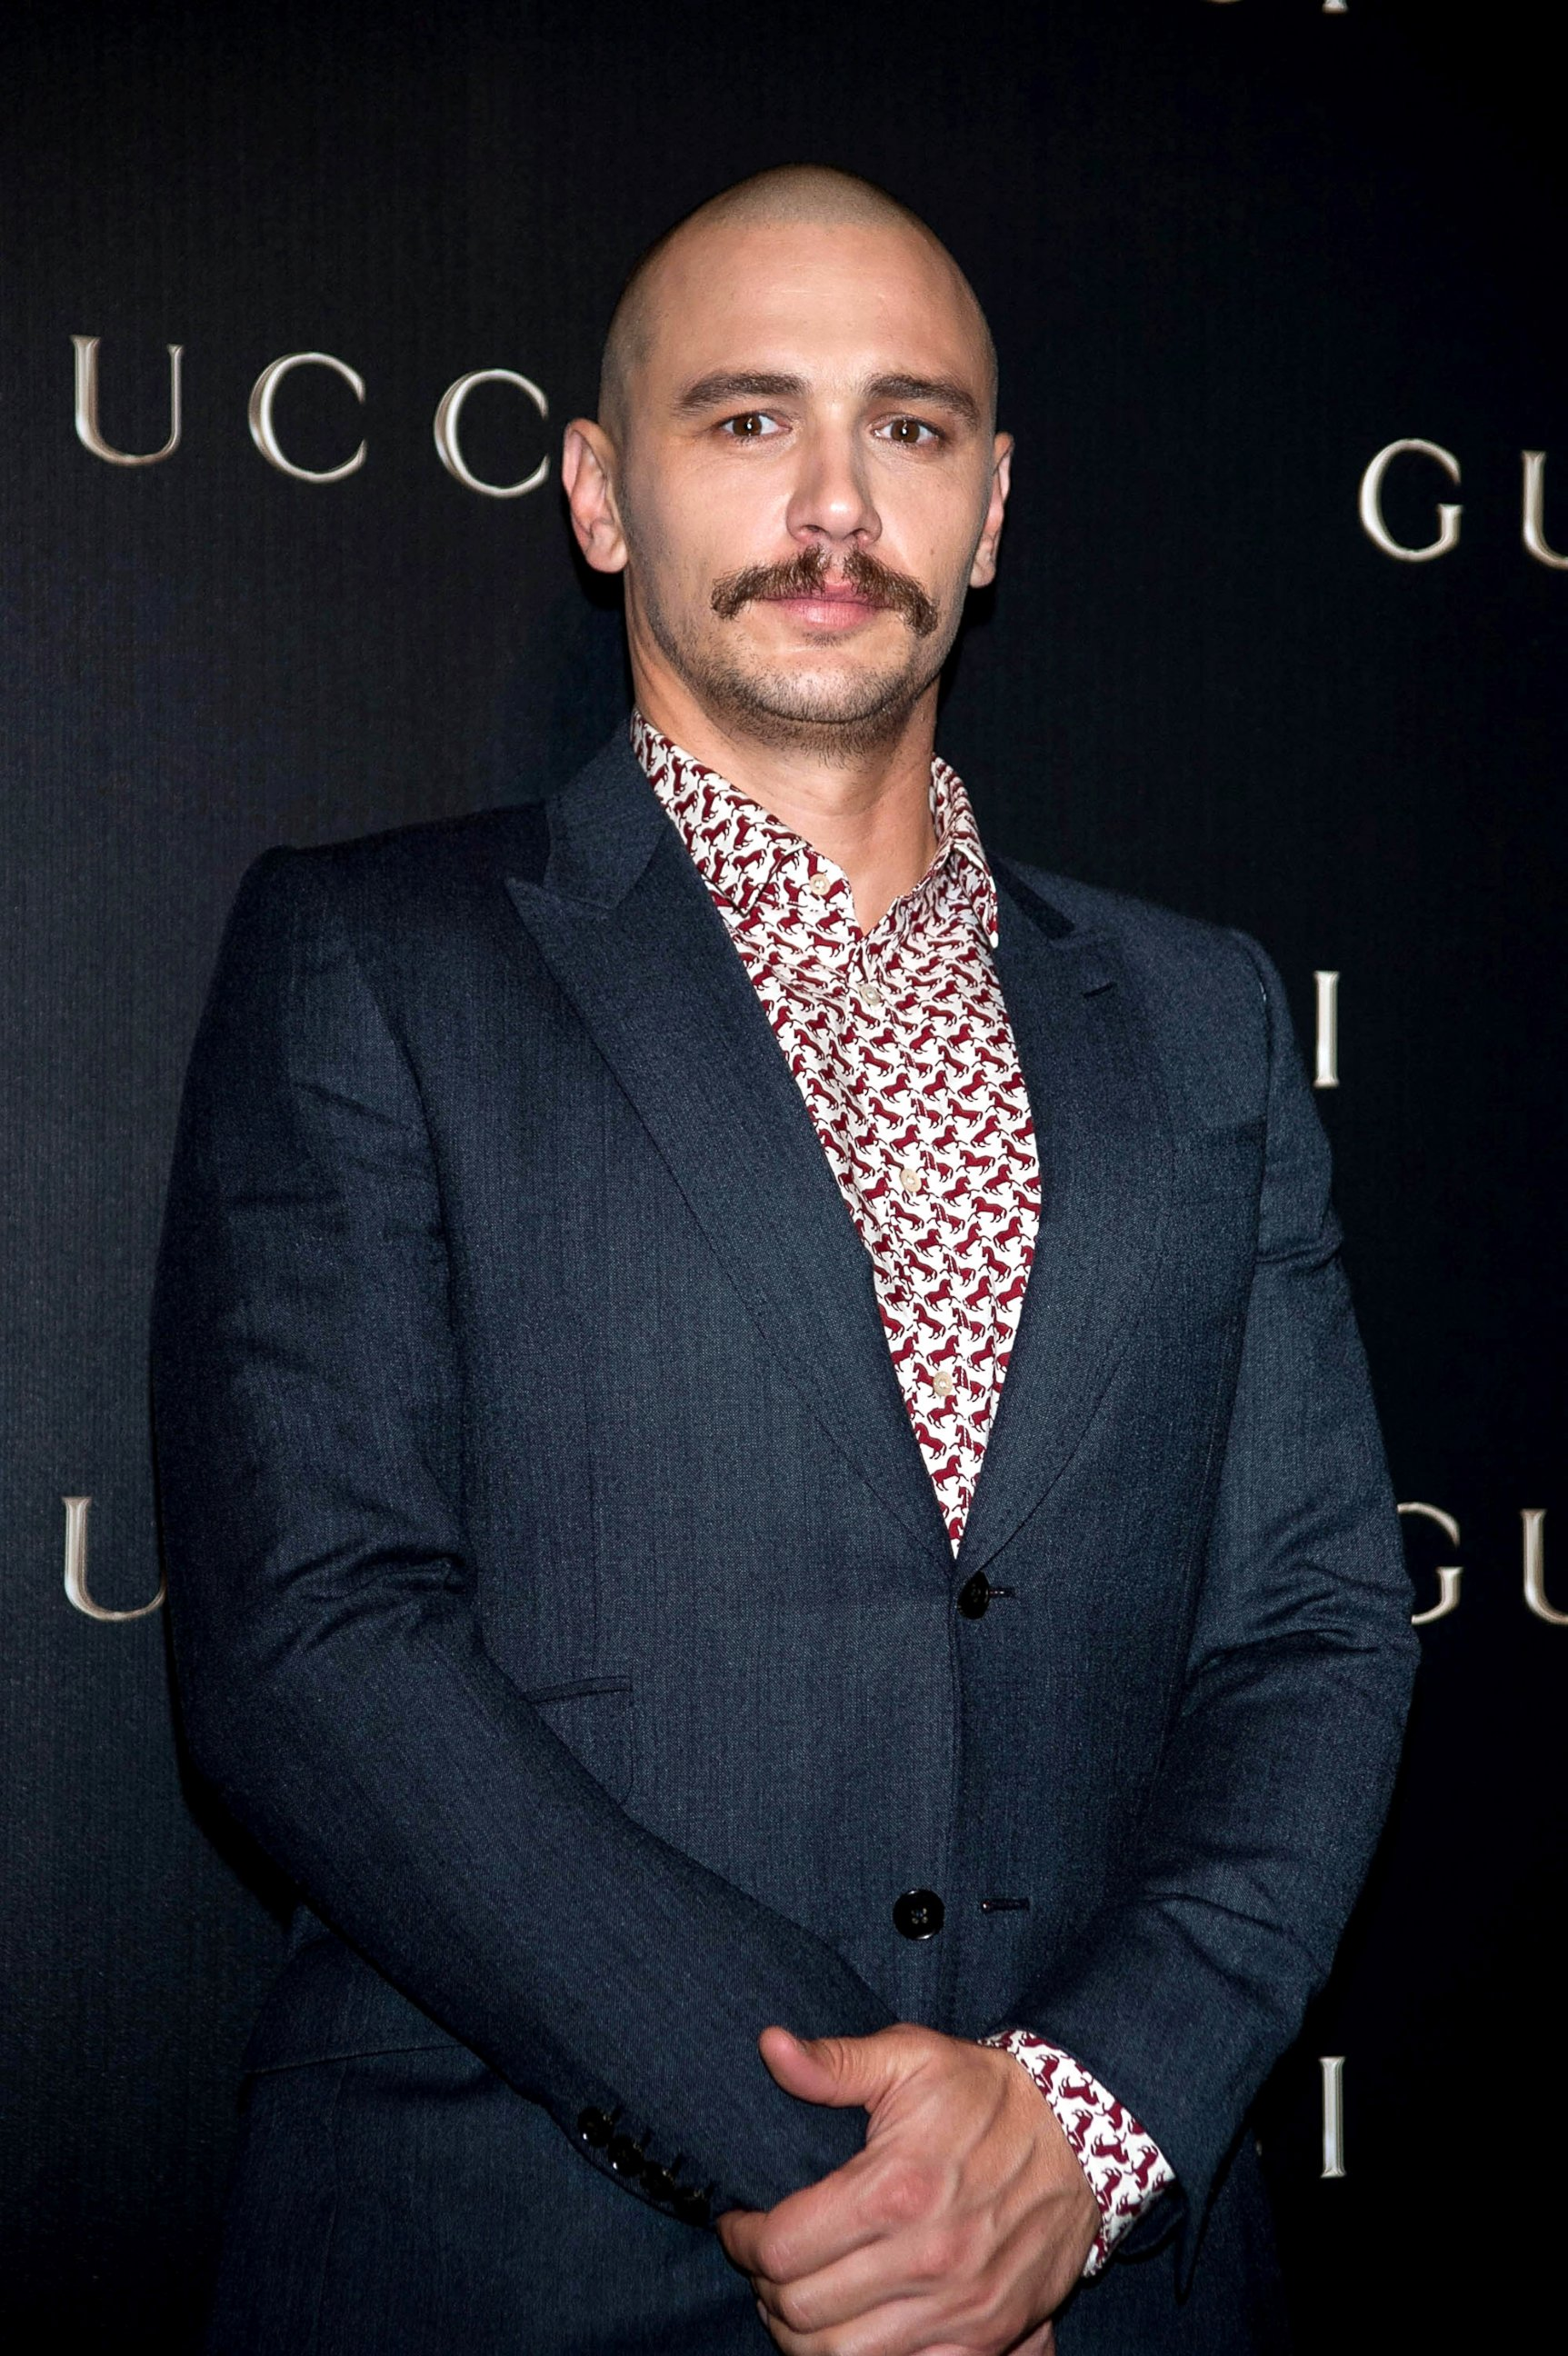 James Franco Rocks a Bald Head and a Bushy Mustache